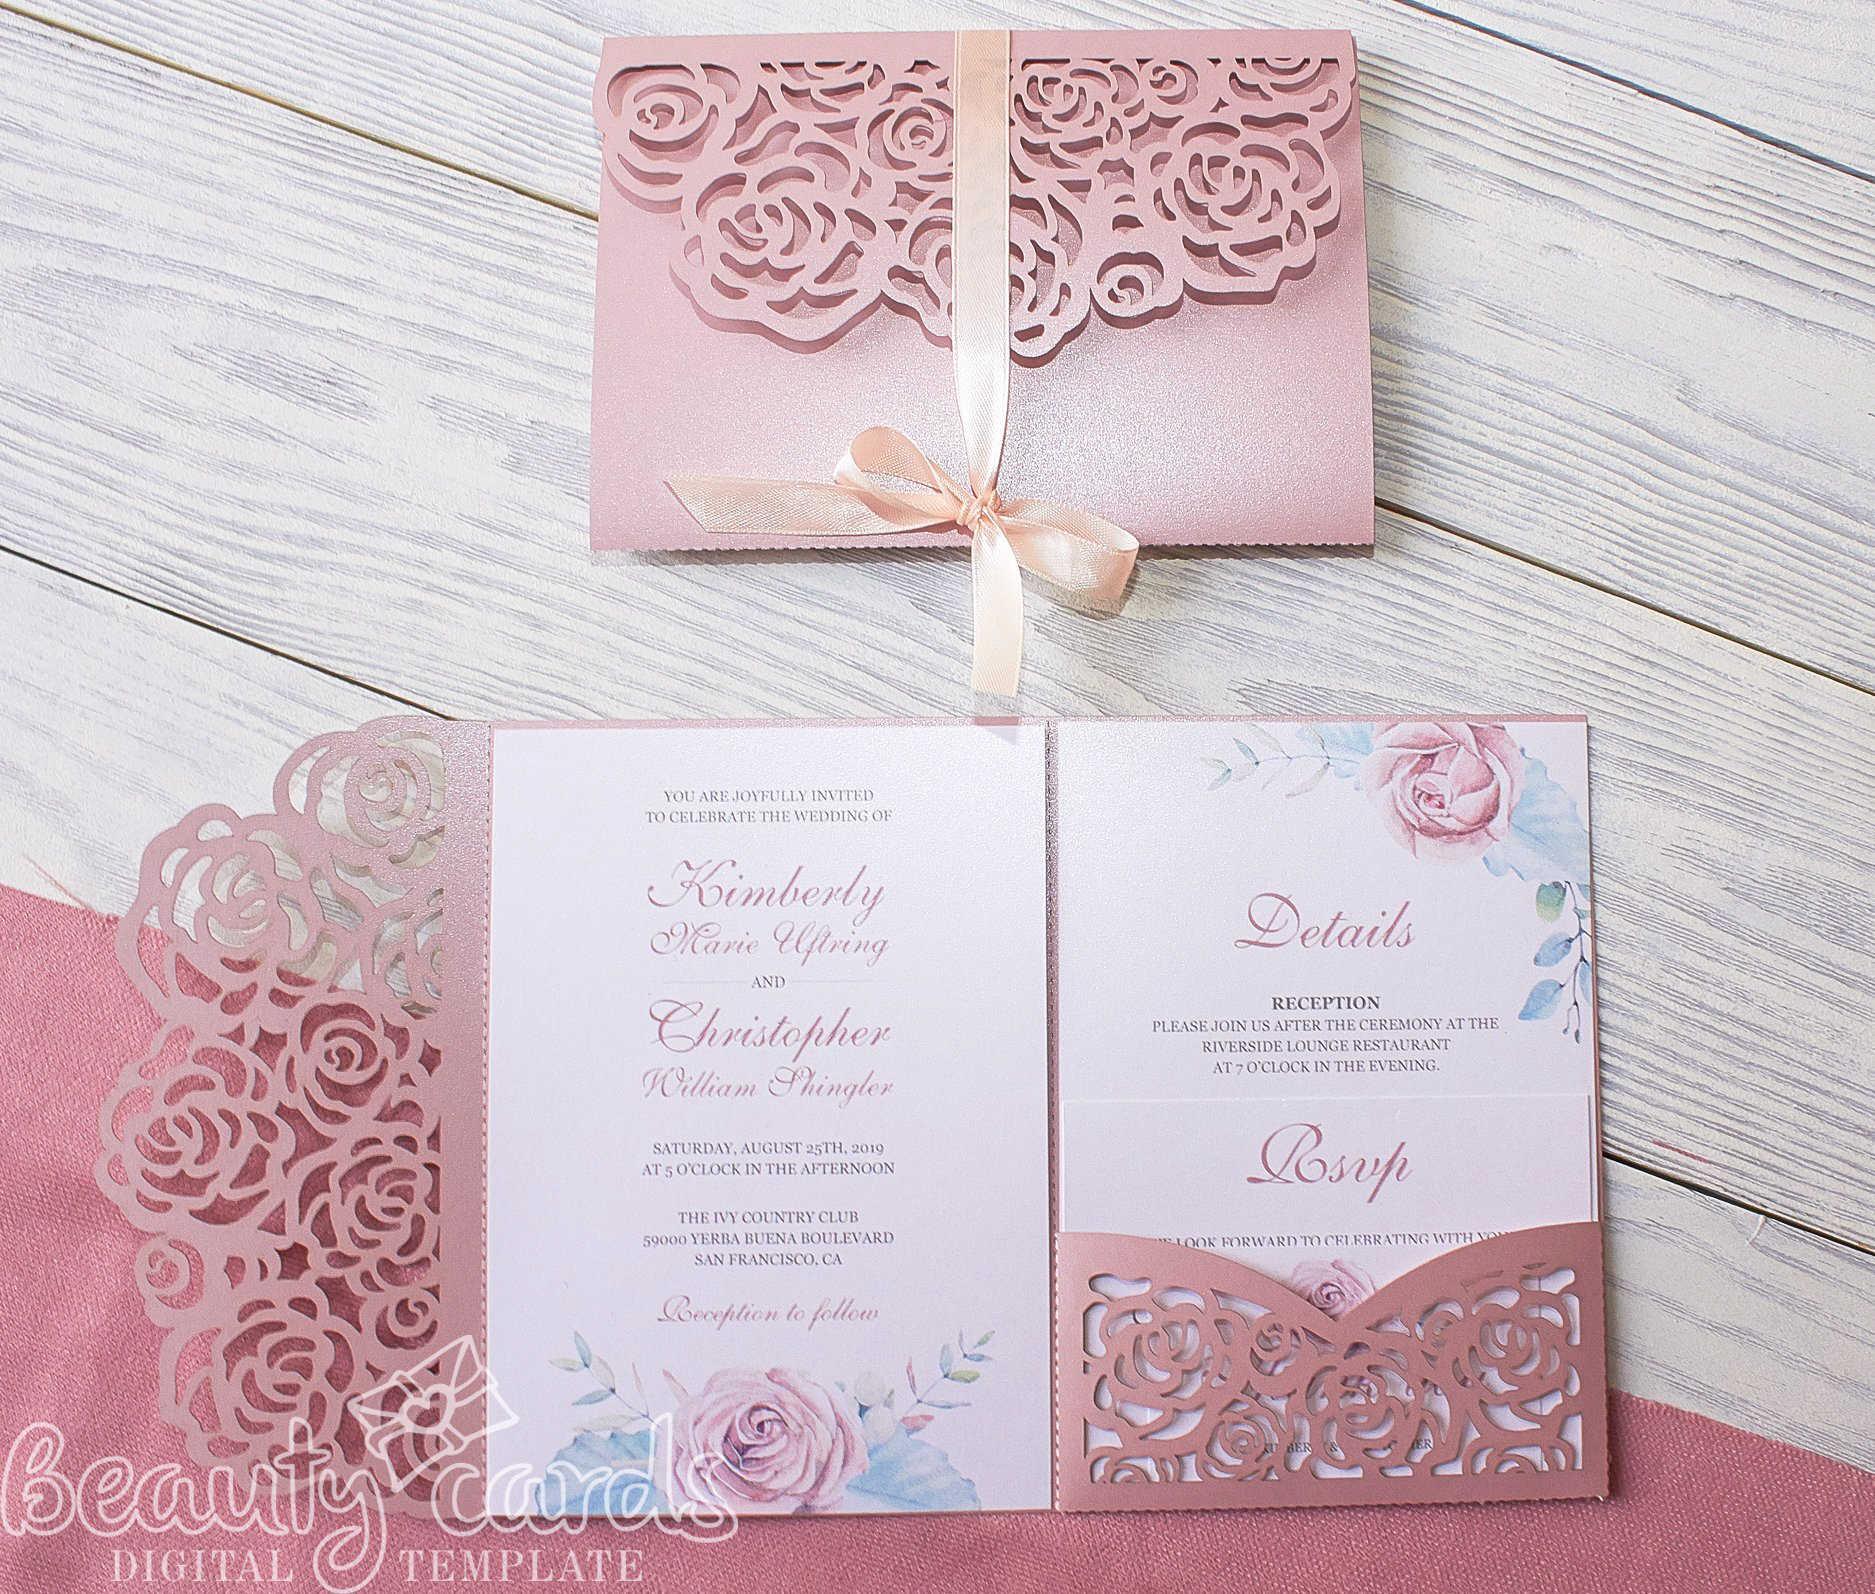 Rose Wedding Invitation Cutting Die Scrapbooking Craft Metal